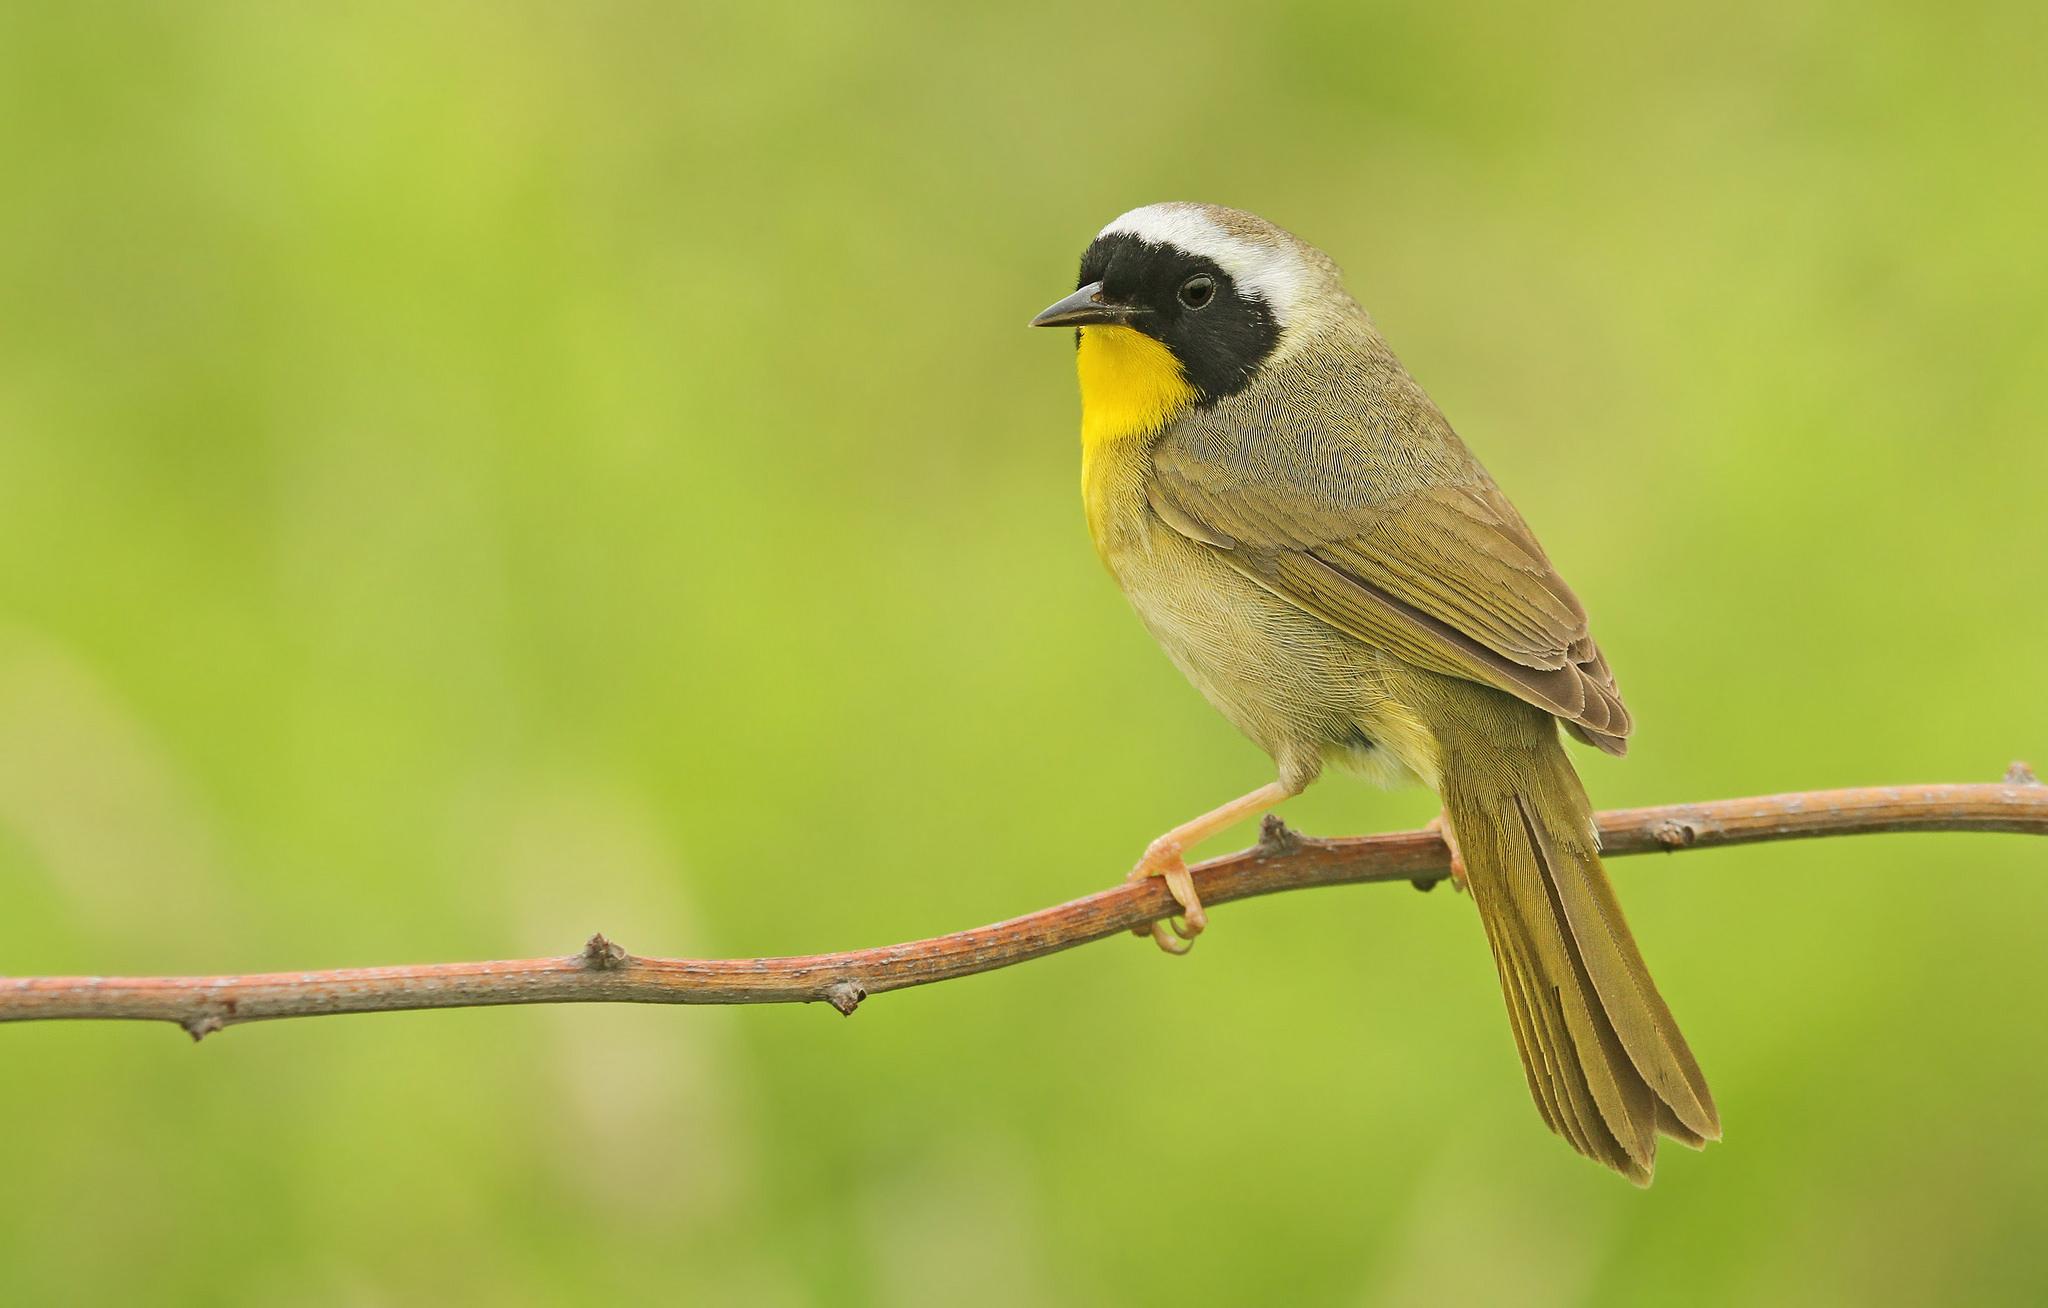 Pájaro pecho amarillo - 2048x1308